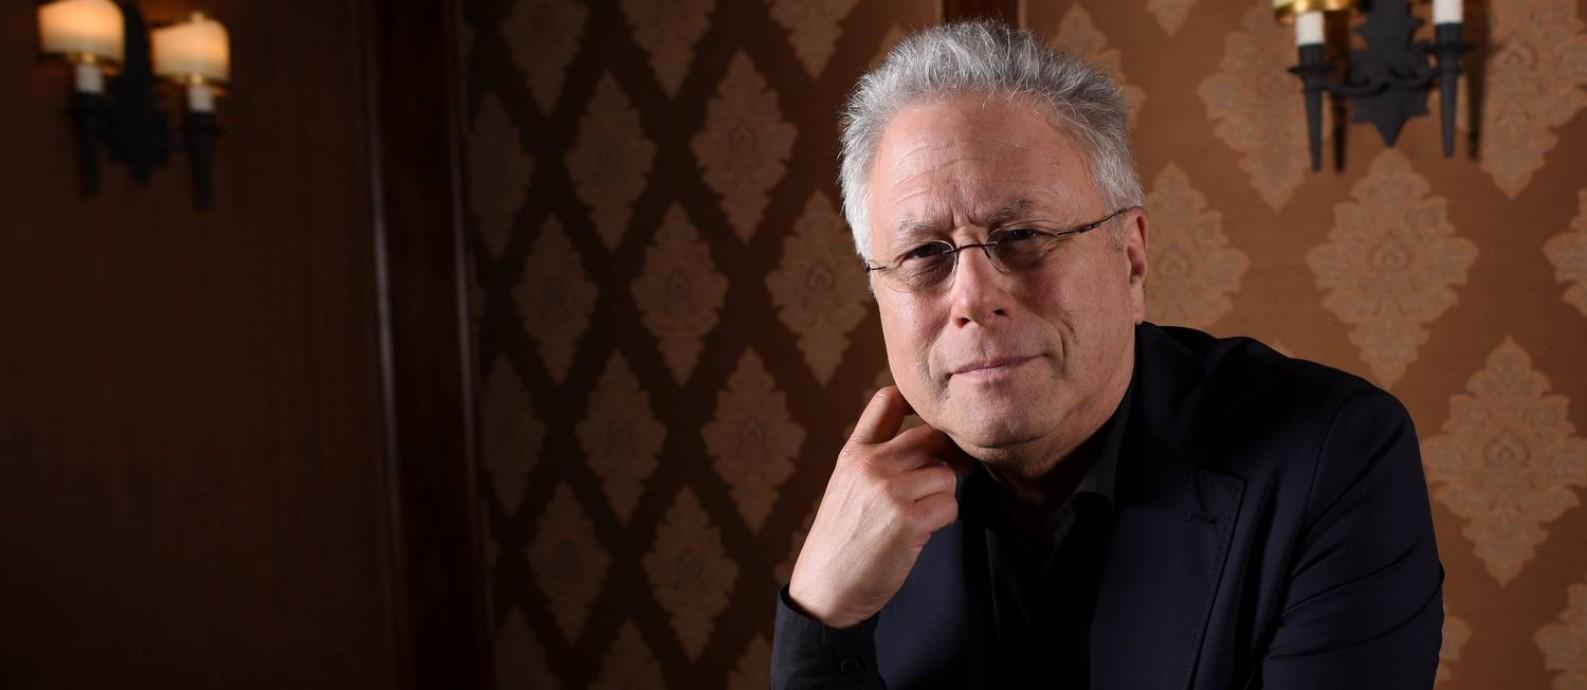 Alan Menken, autor da trilha sonora de 'A Bela e a Fera Foto: PHIL MCCARTEN / REUTERS